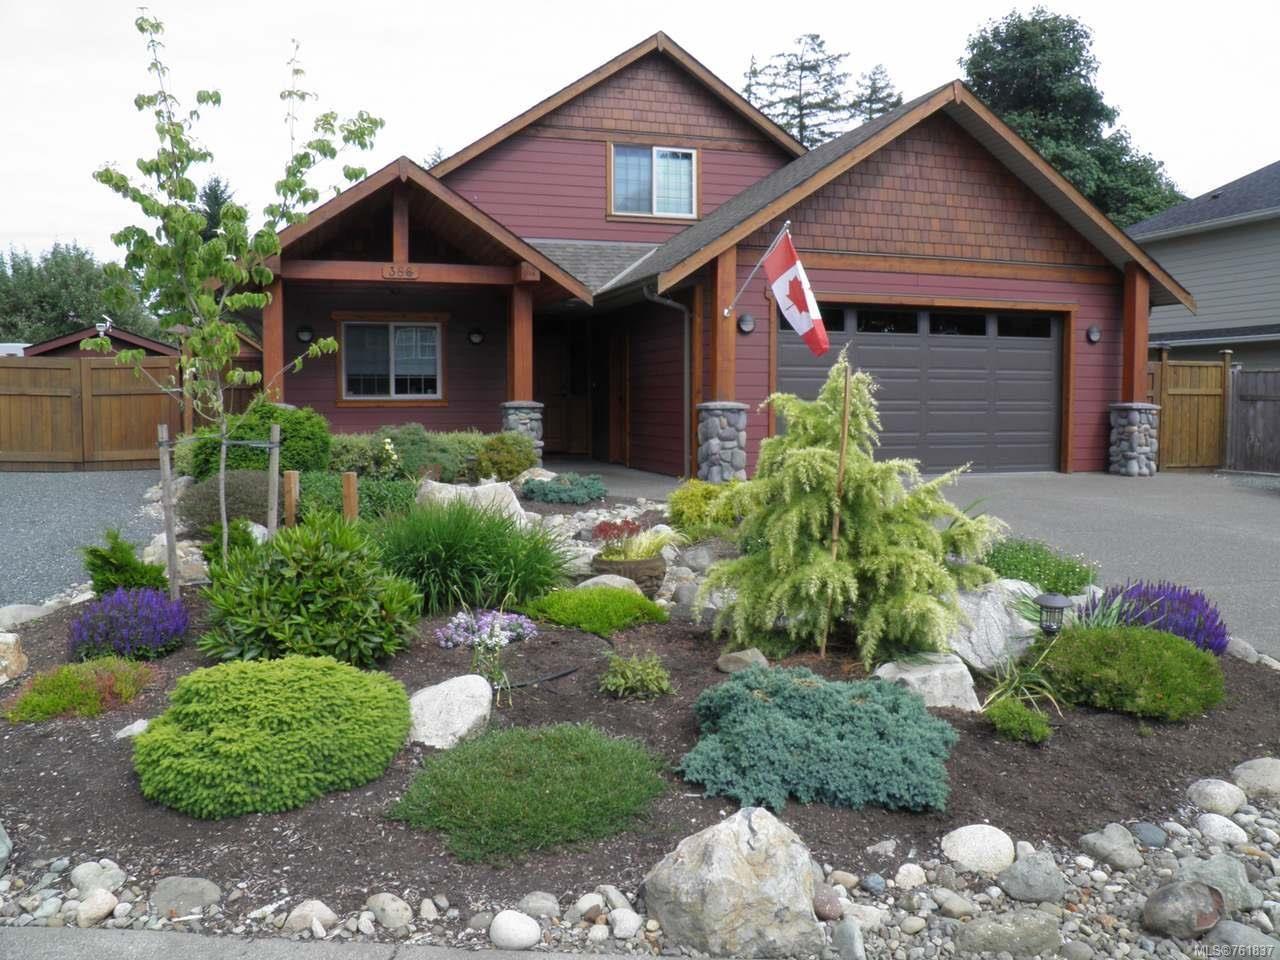 Main Photo: 388 Ensign St in COMOX: CV Comox (Town of) House for sale (Comox Valley)  : MLS®# 761837